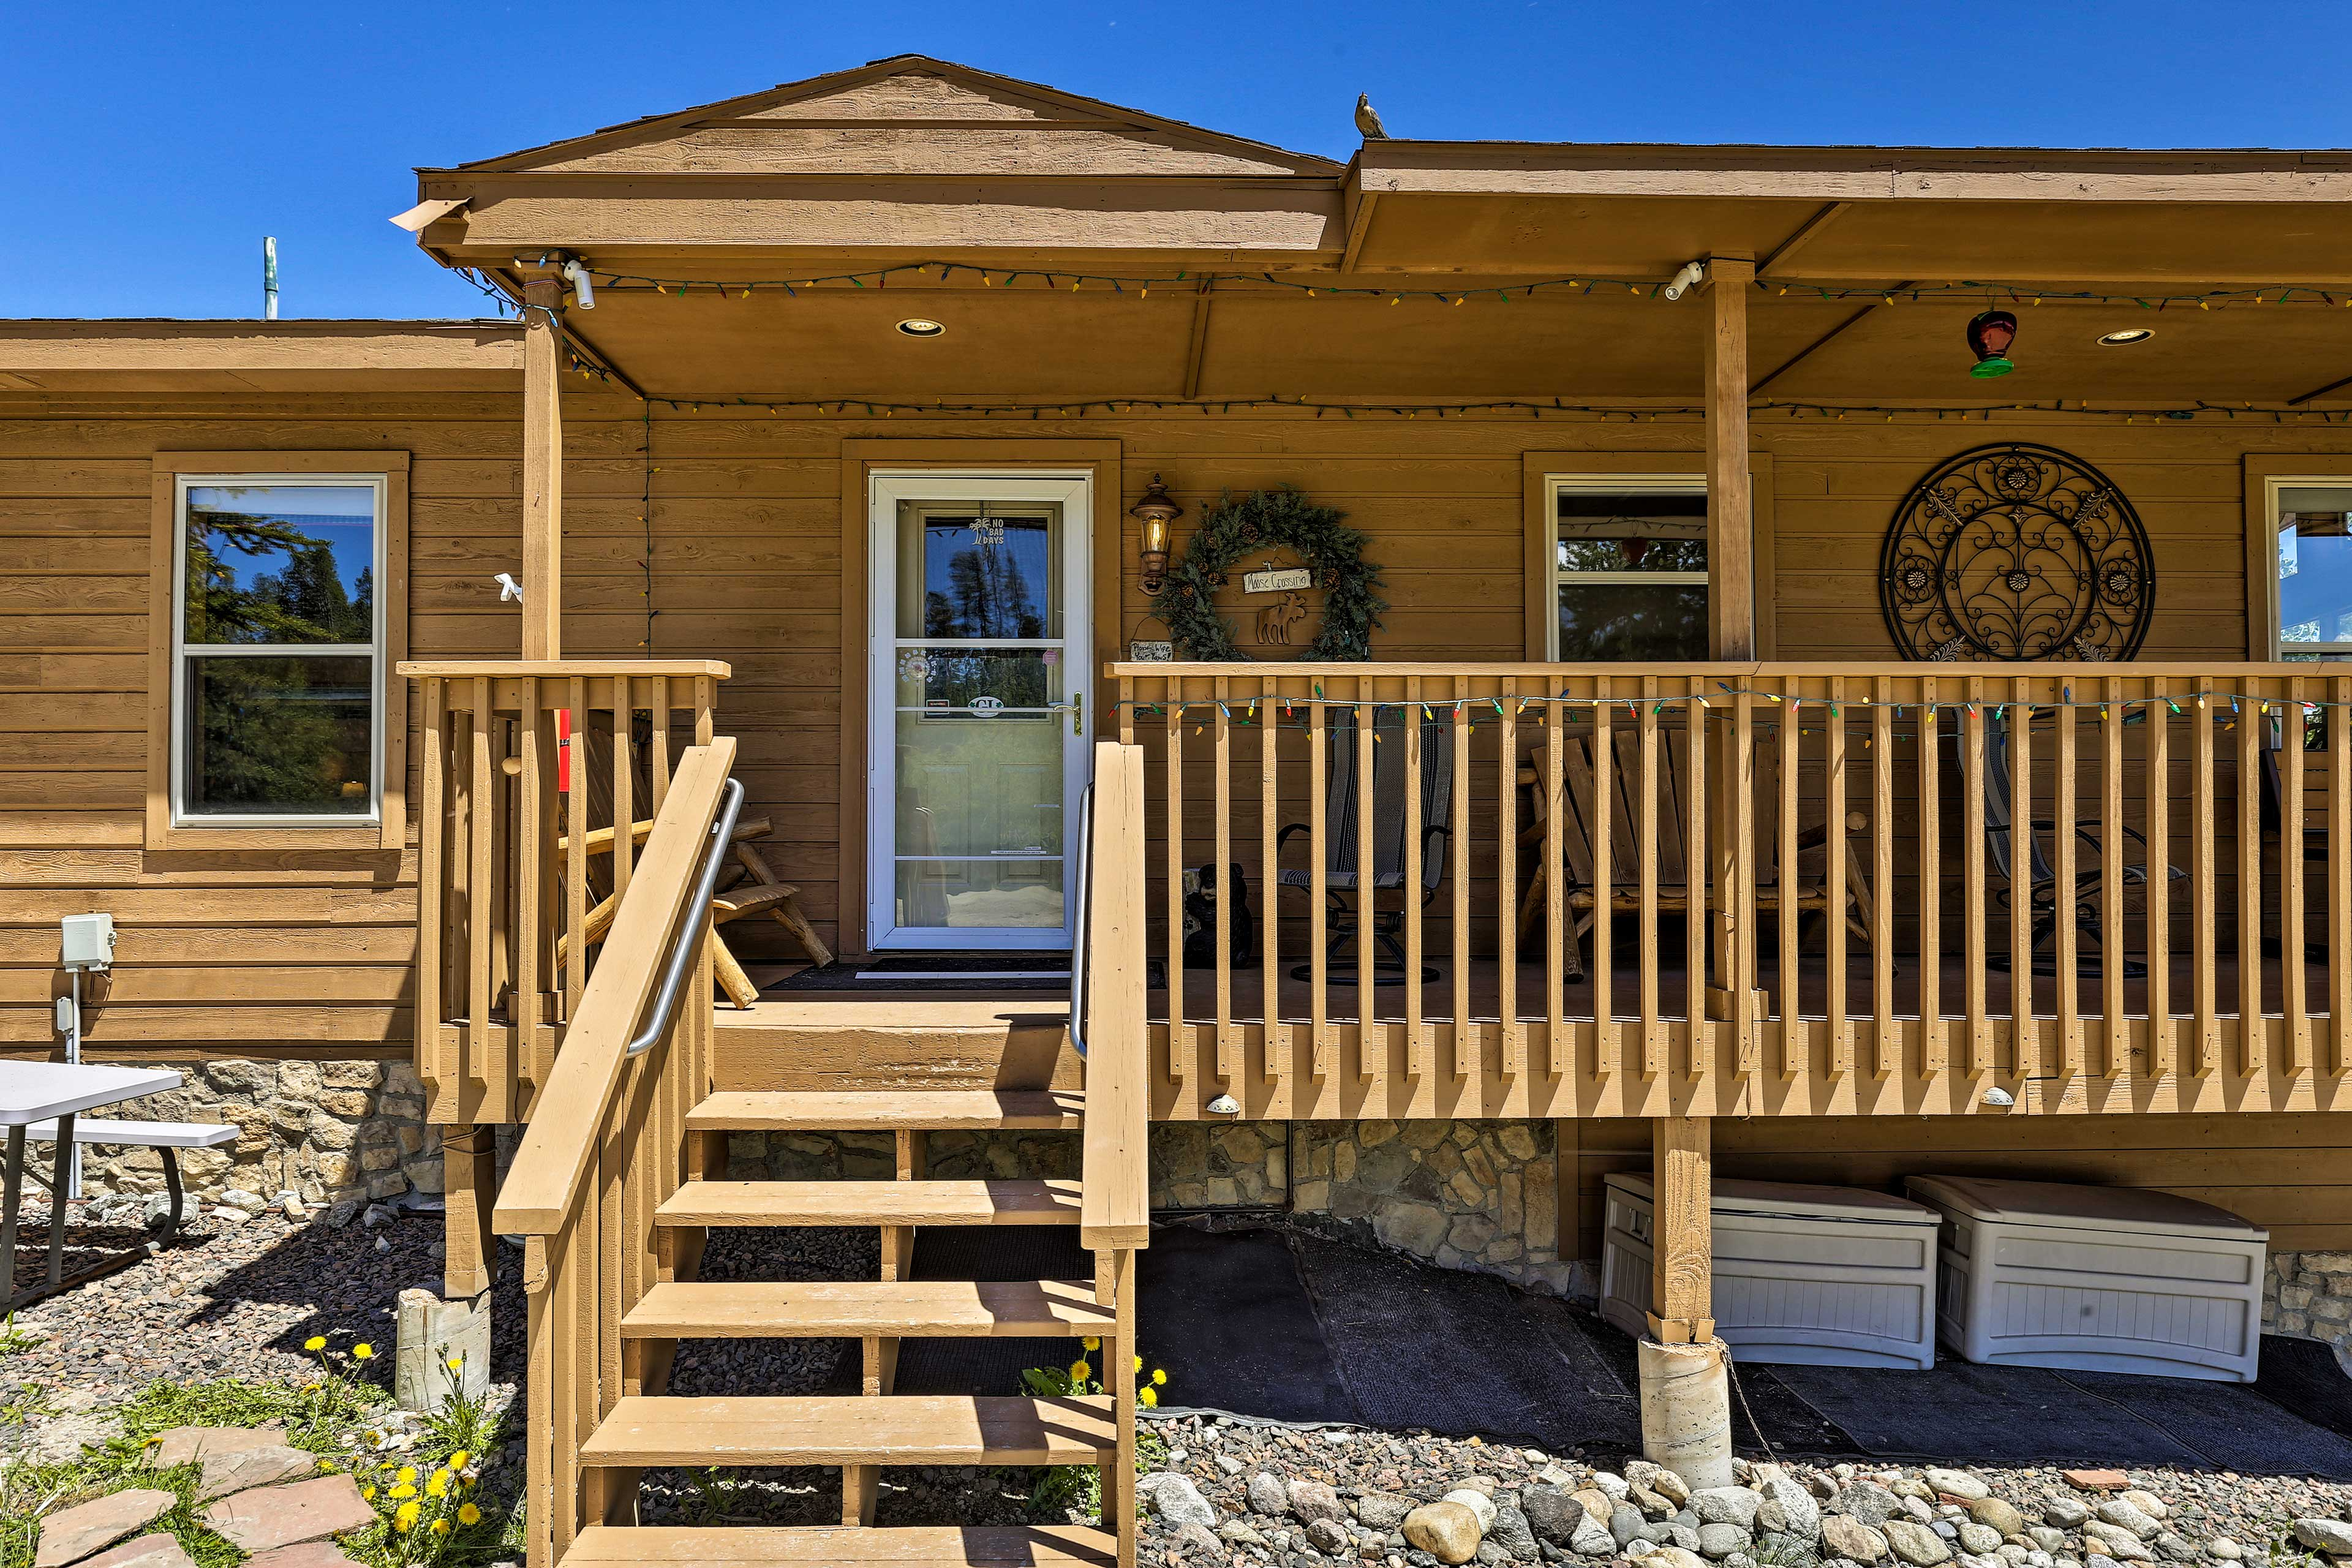 Make yourself at home at this 3-bedroom, 2-bath vacation rental!